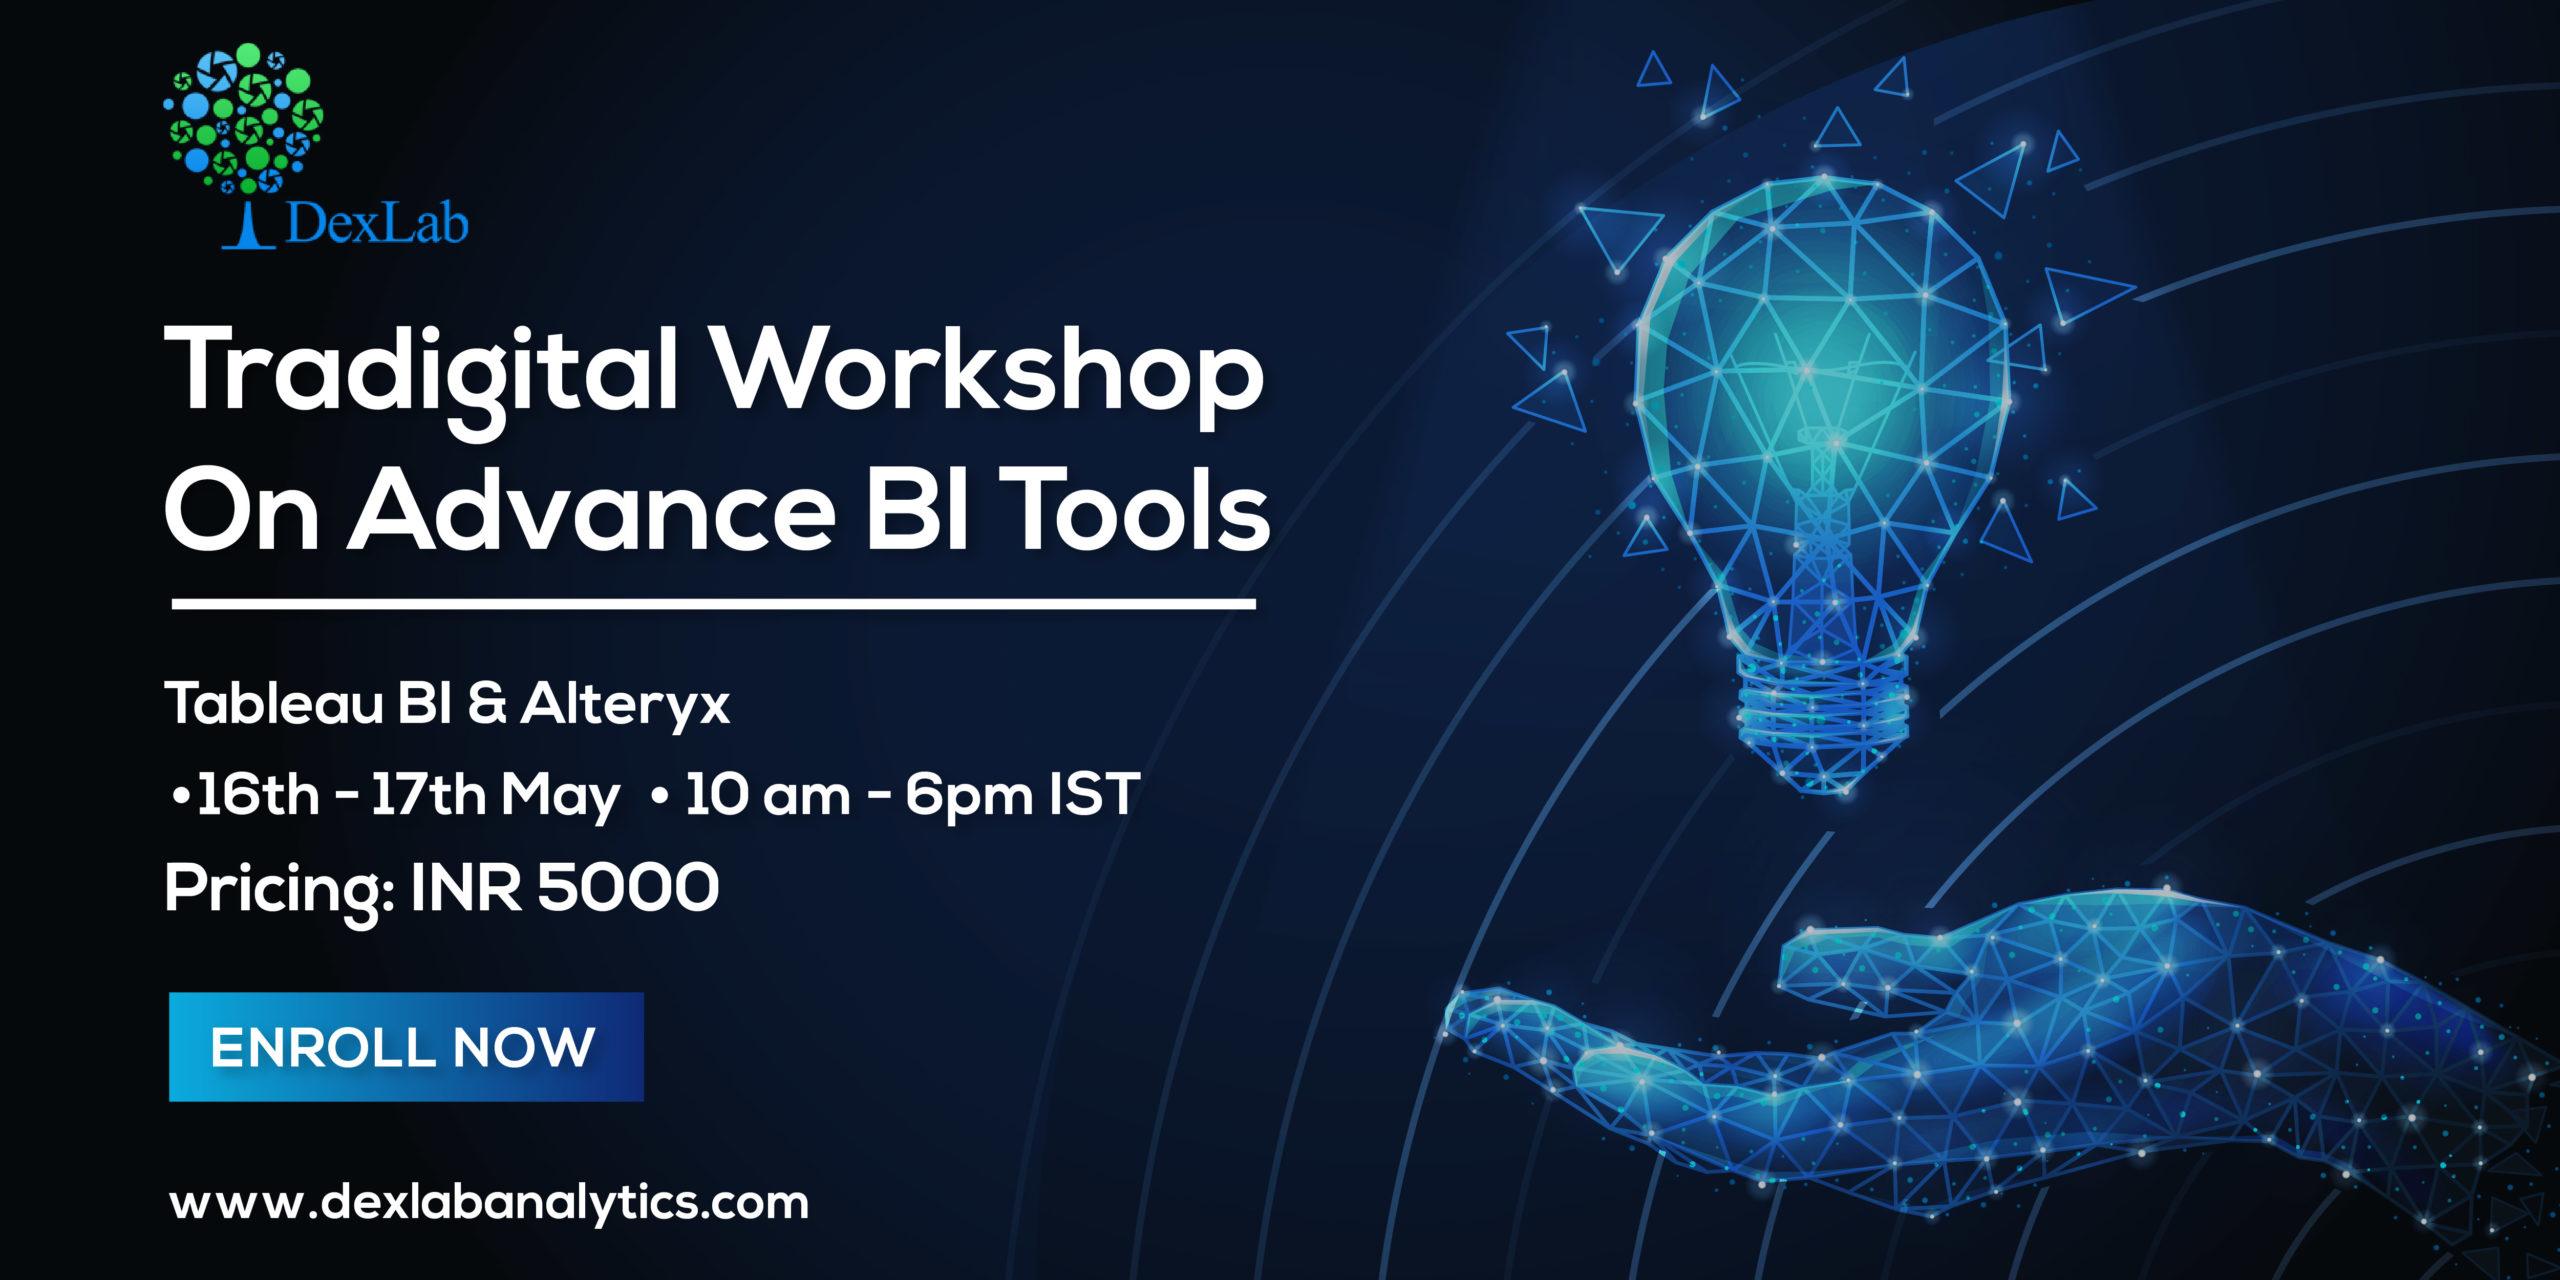 Tradigital Workshop On Advance BI Tools